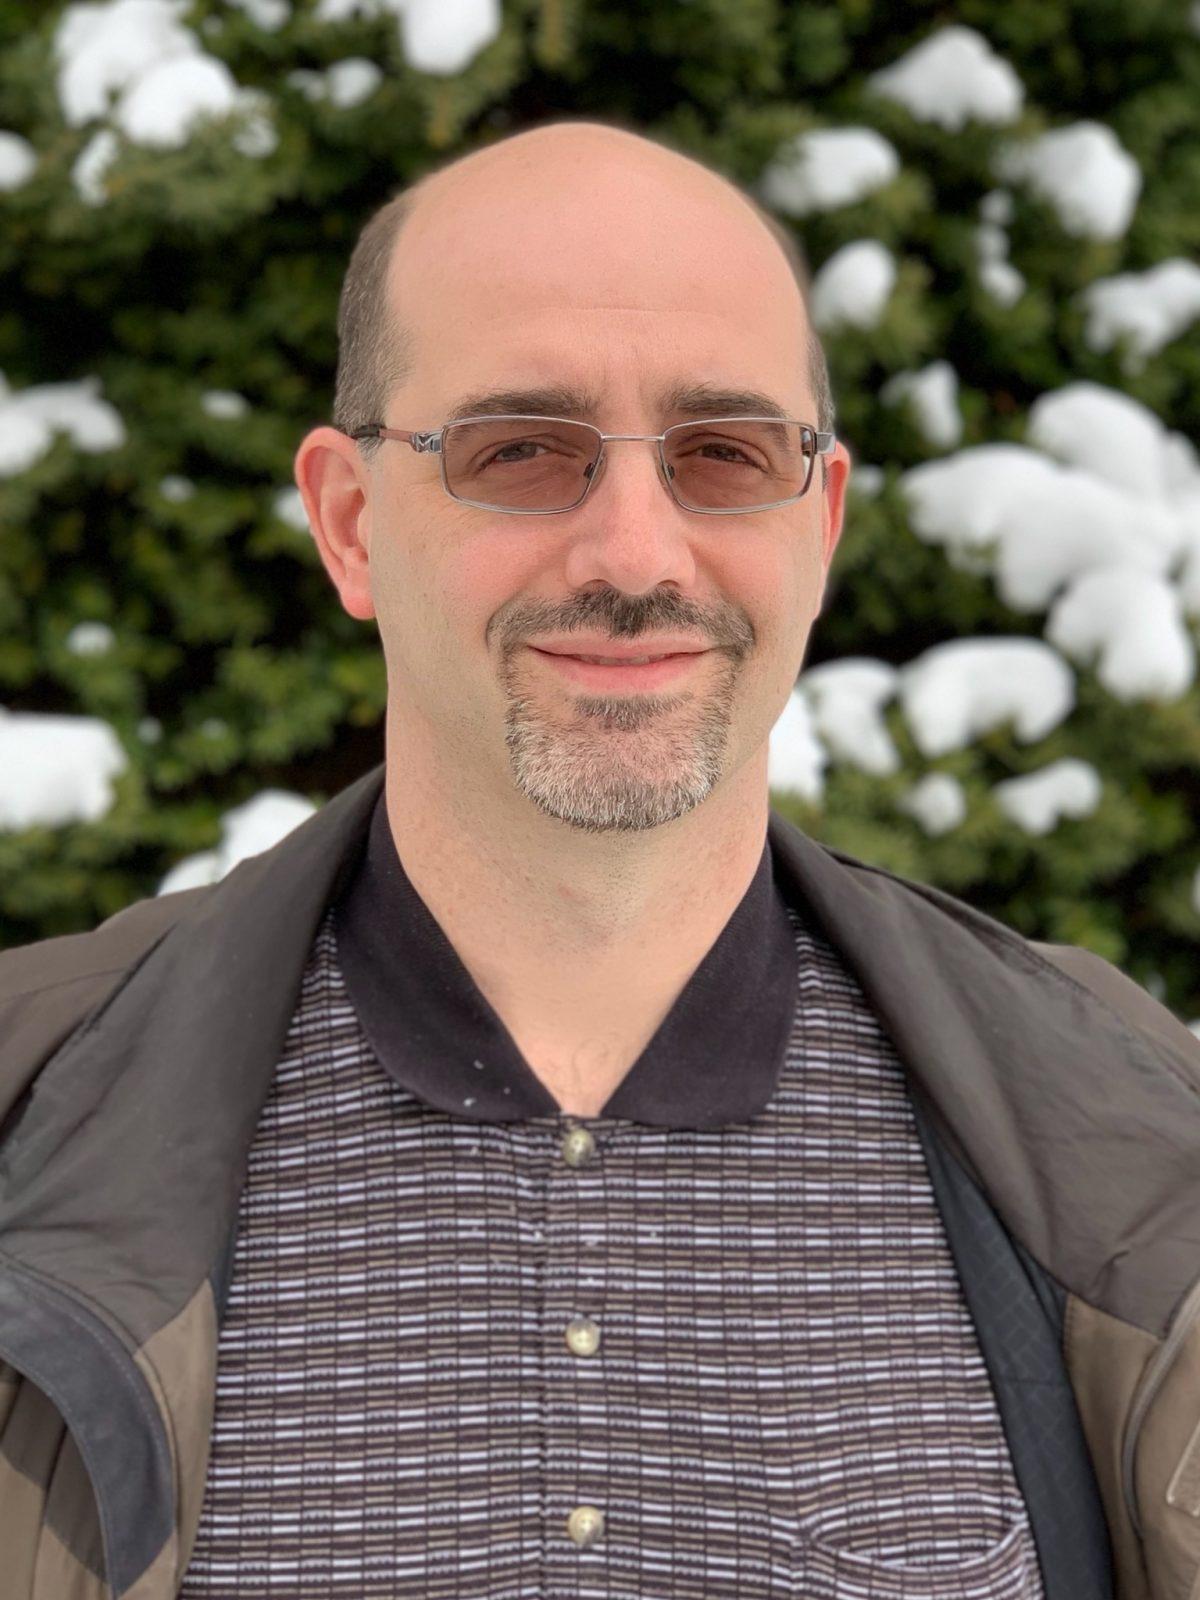 Jim Castlebury, Services Facilitator of The Arc of Southeast Iowa